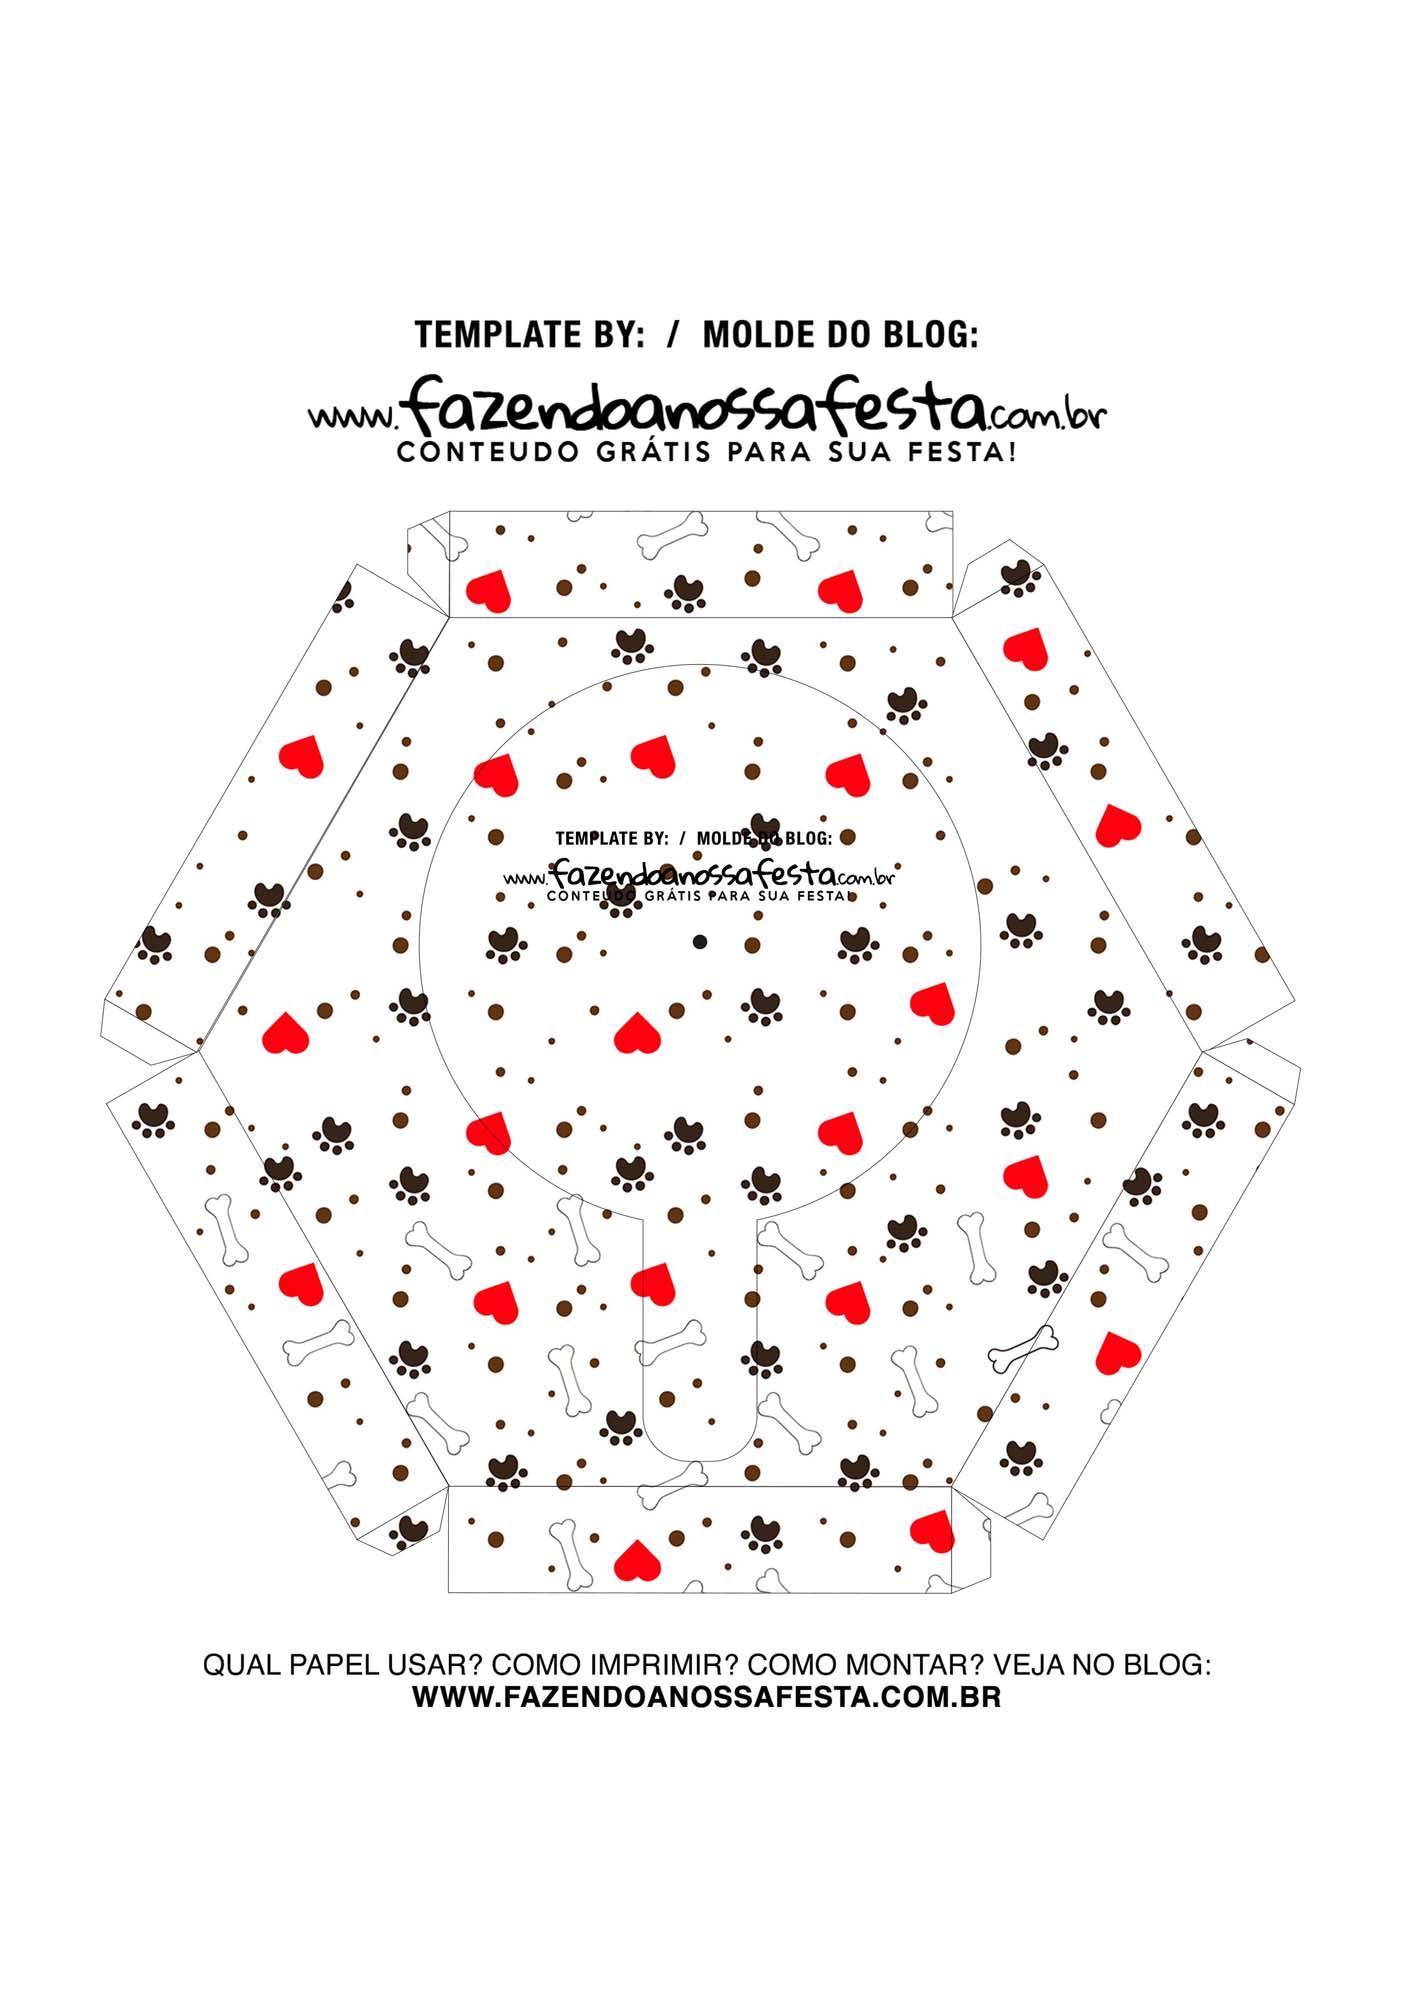 Caixa Explosiva Dia das Maes de pet 7